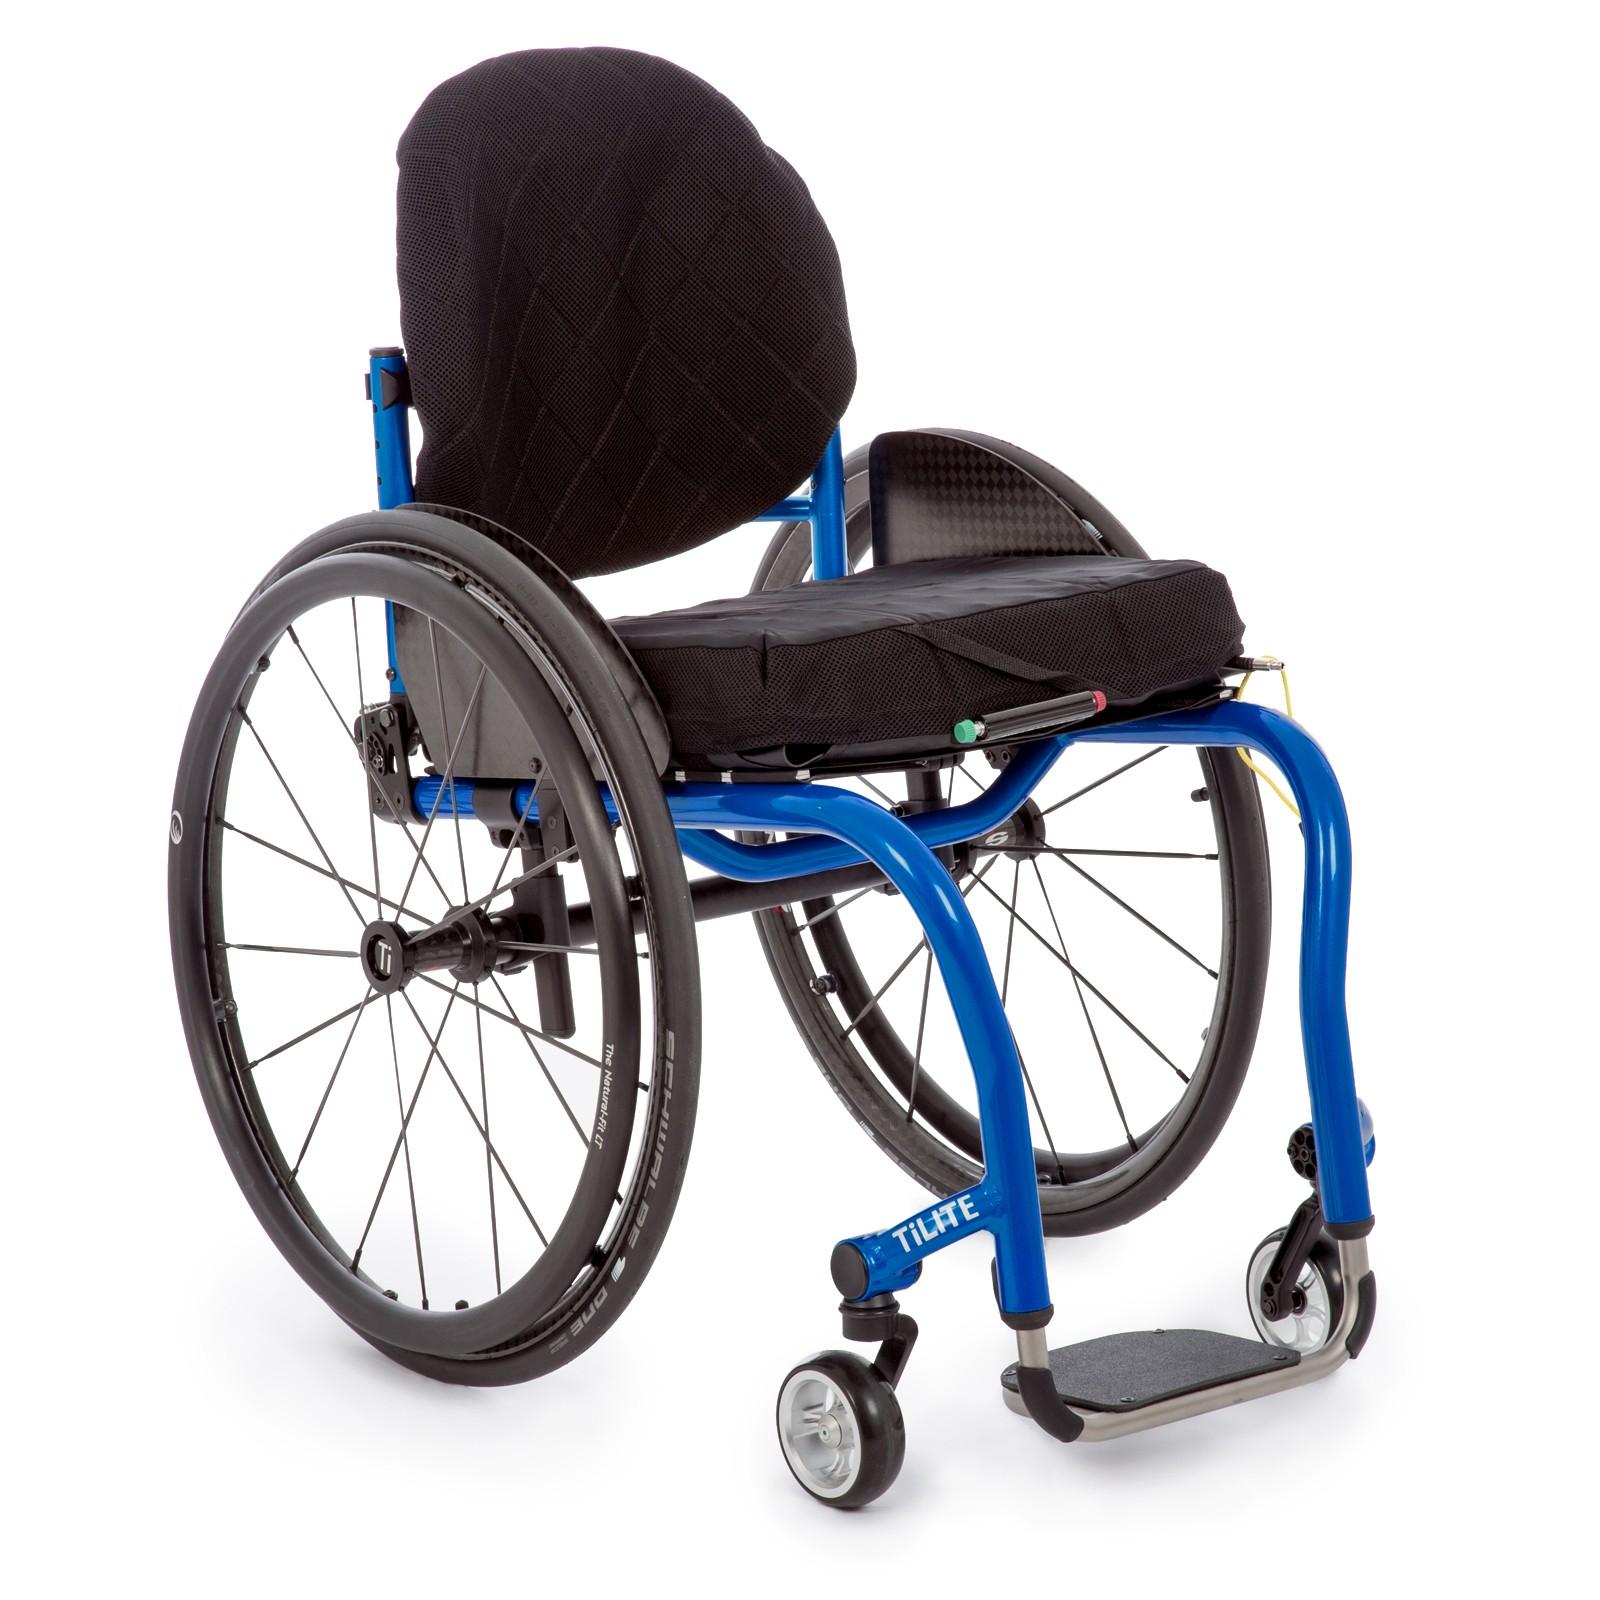 Blue Deluxe Folding & Rigid Ultra Light Wheelchair for Rental